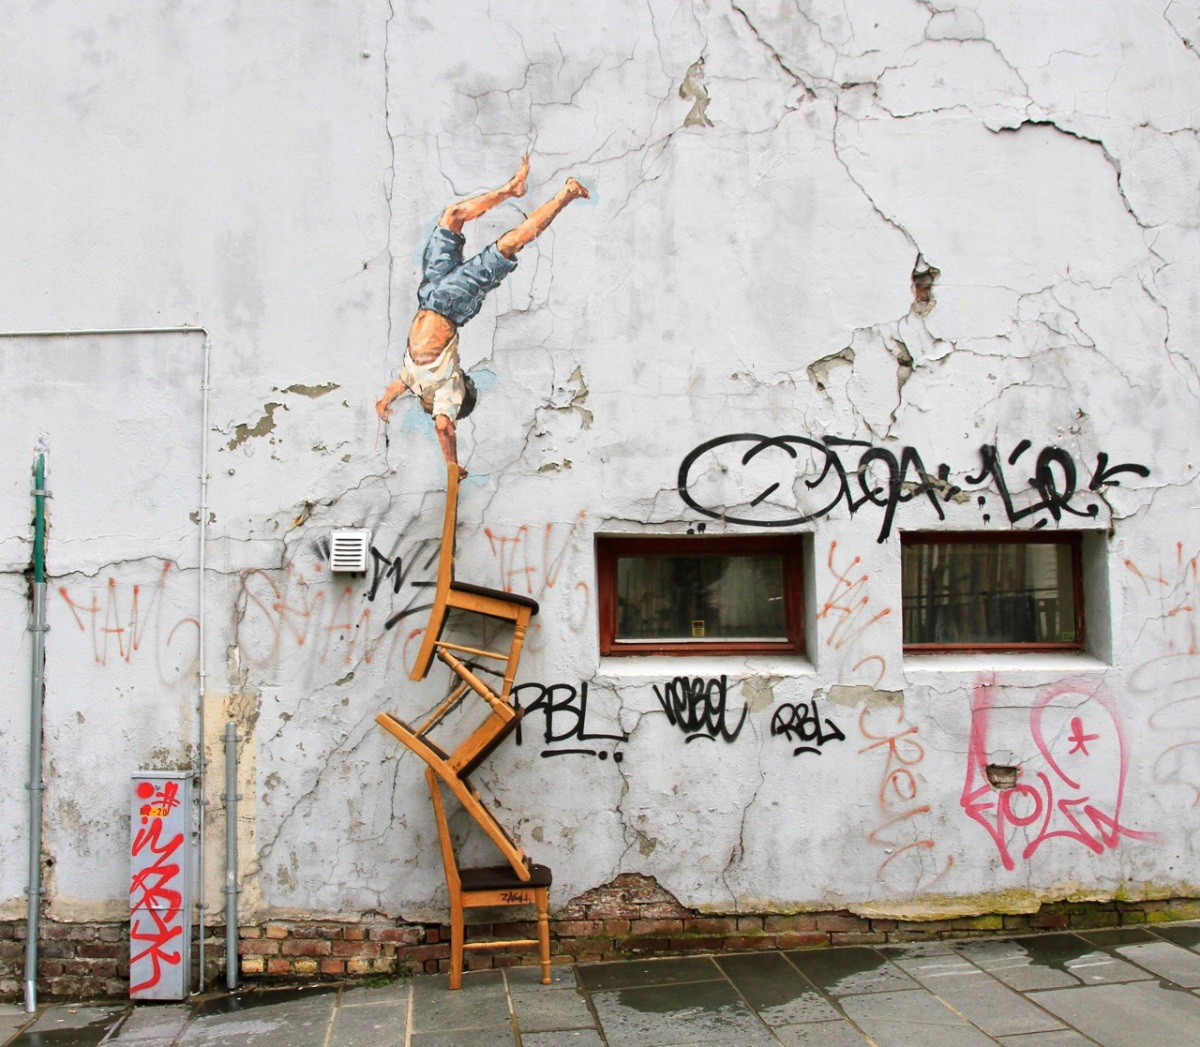 Stavanger: the unlikely street artcapital